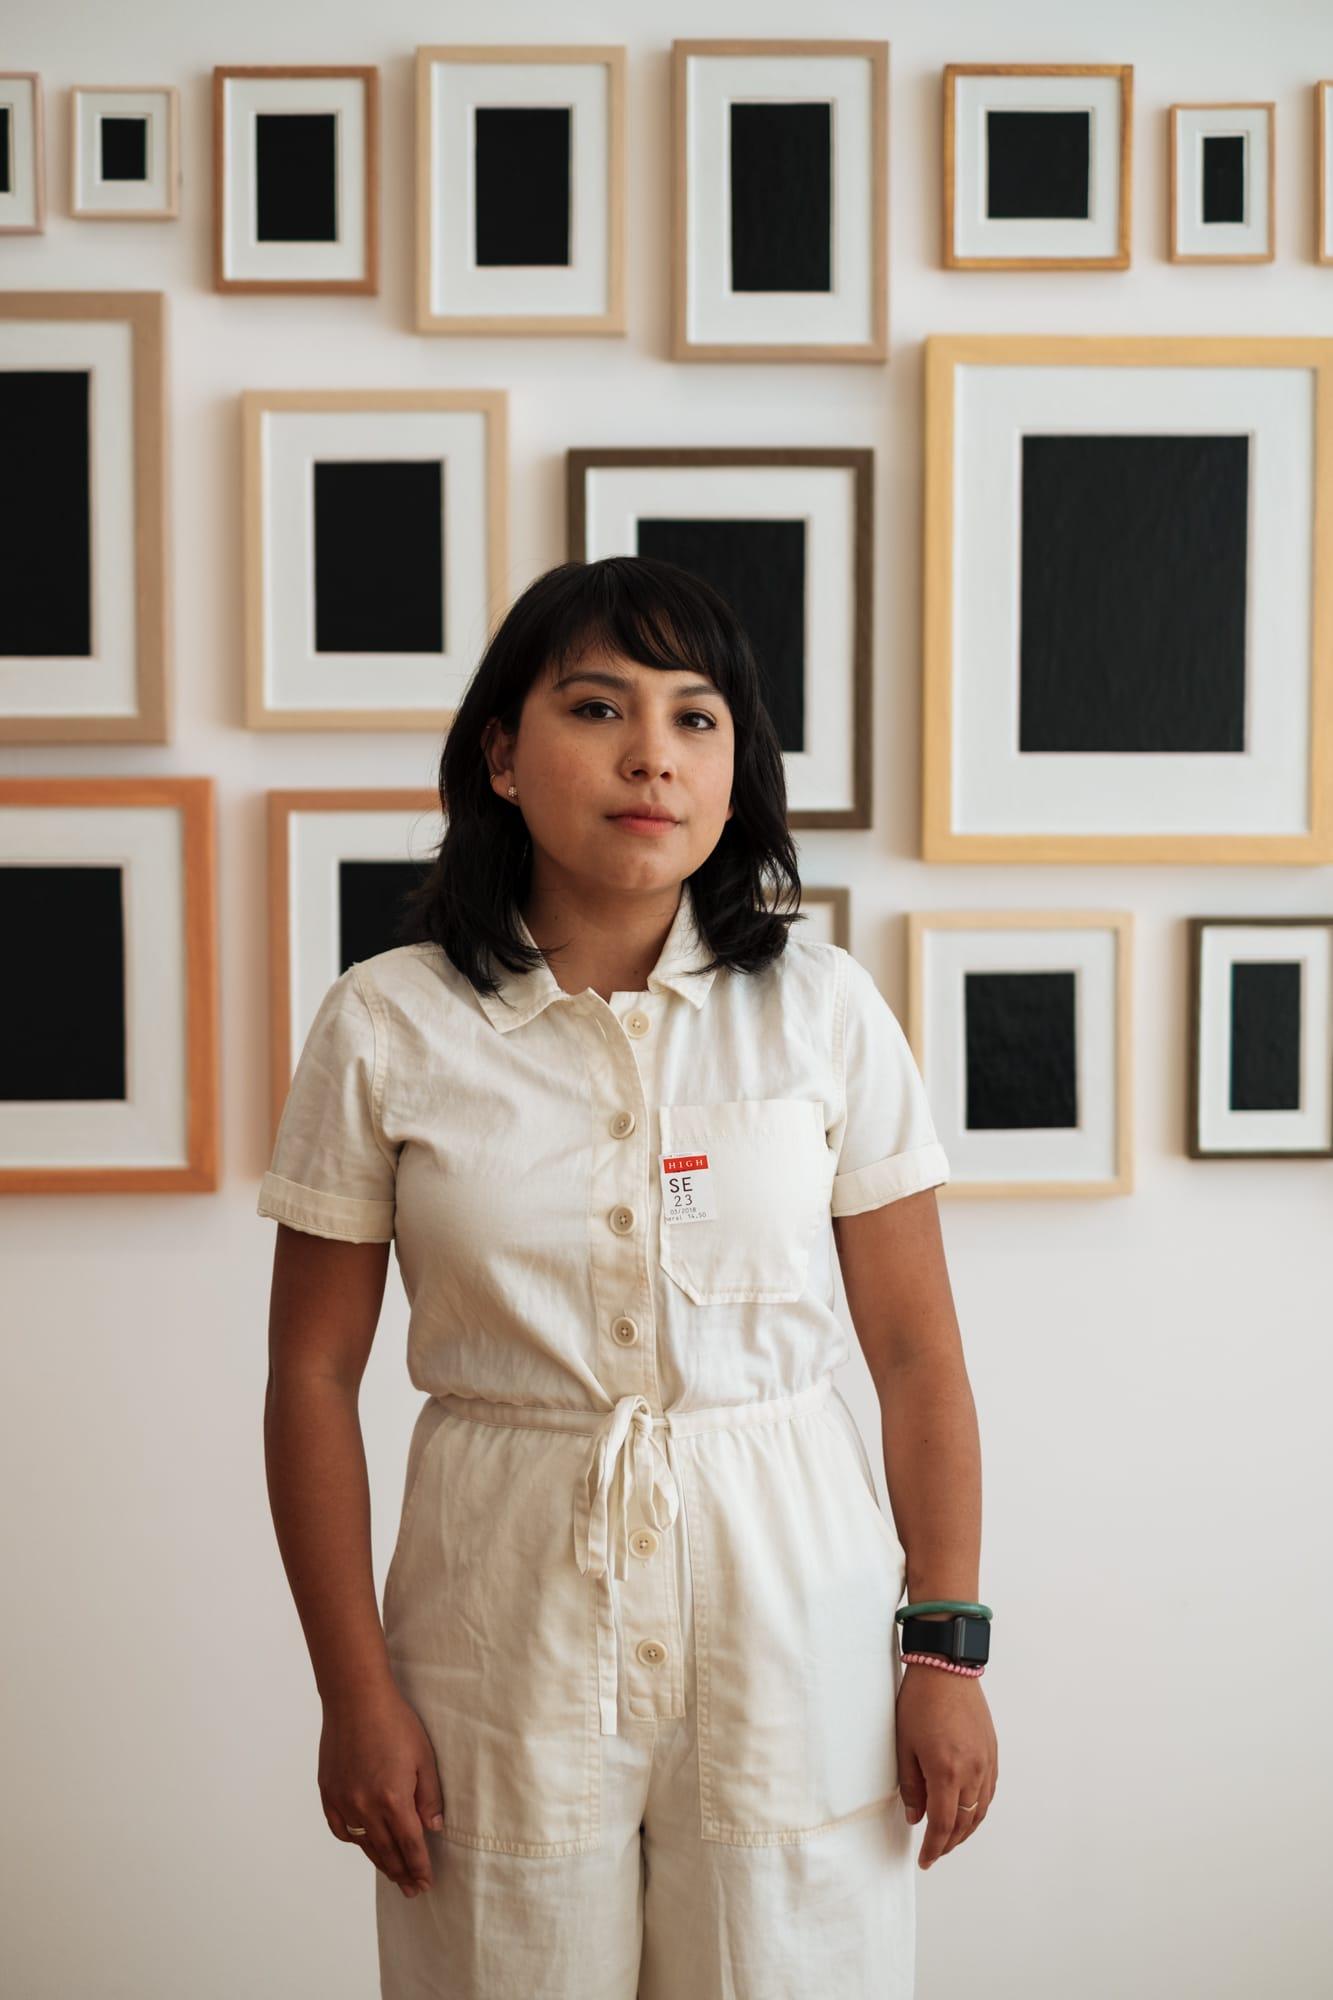 portrait of woman in front of an art exhibit